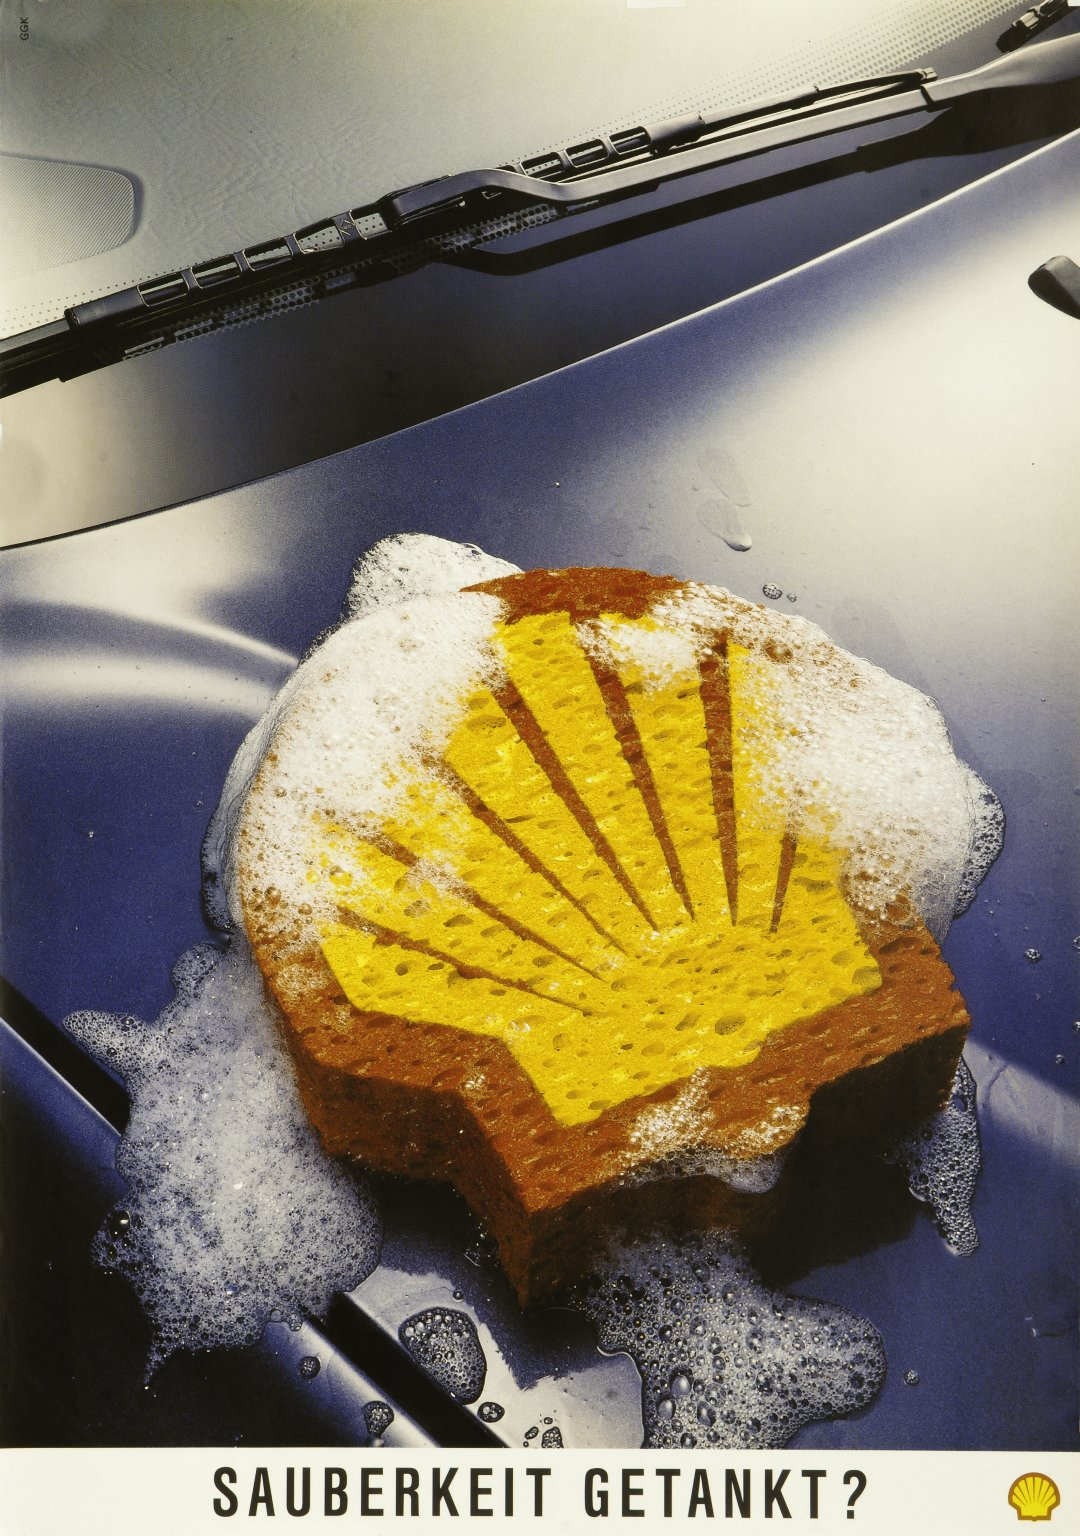 Shell: Sauberkeit getankt?